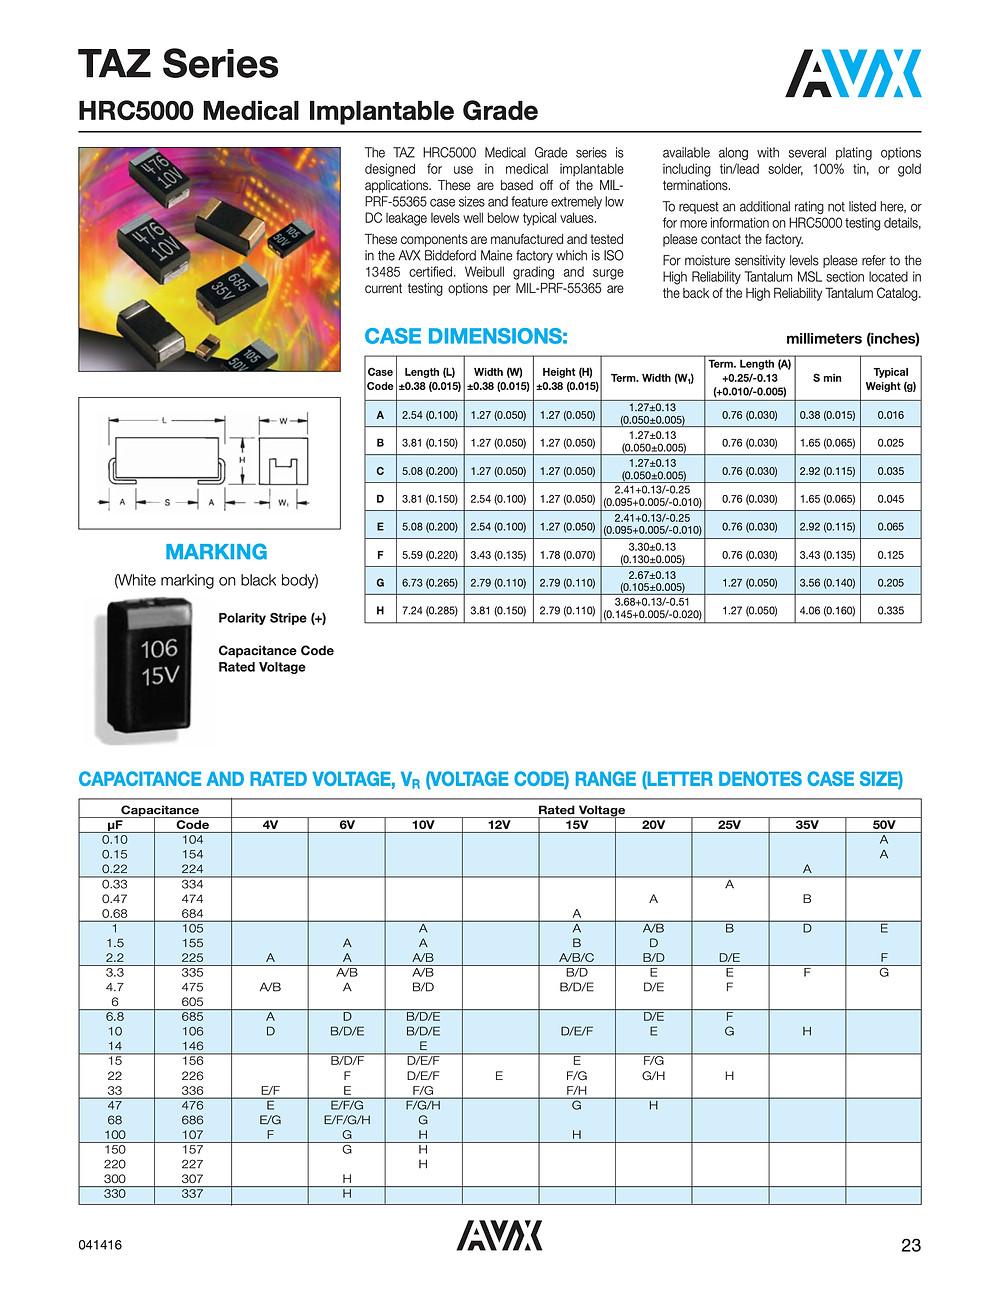 AVX TAZ HRC5000 Series Capacitor